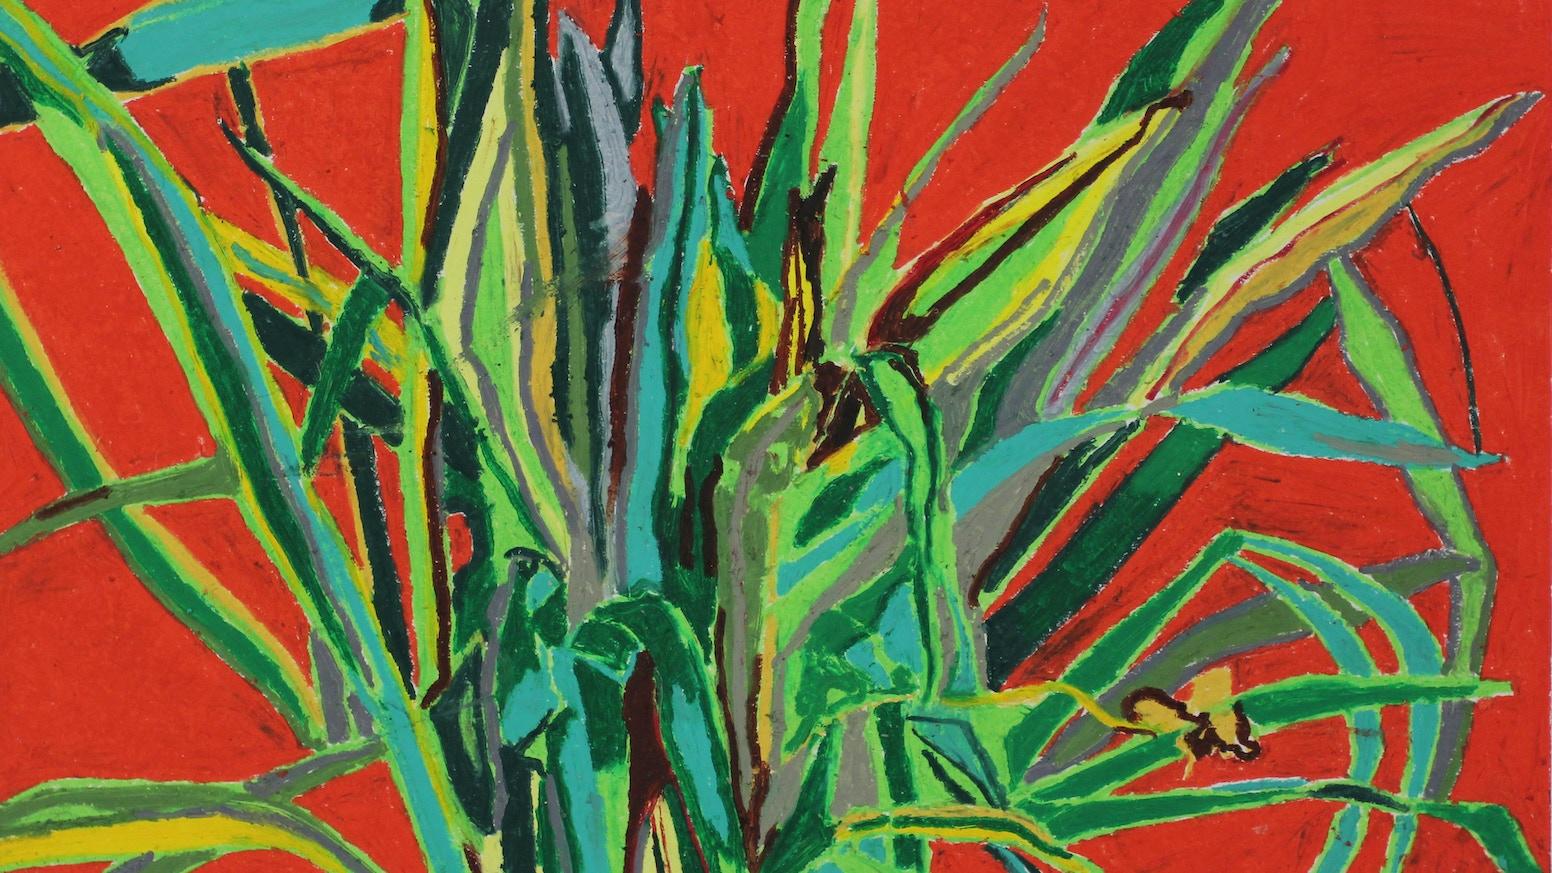 Framing Work for an Exhibition by Shanti Gorton — Kickstarter